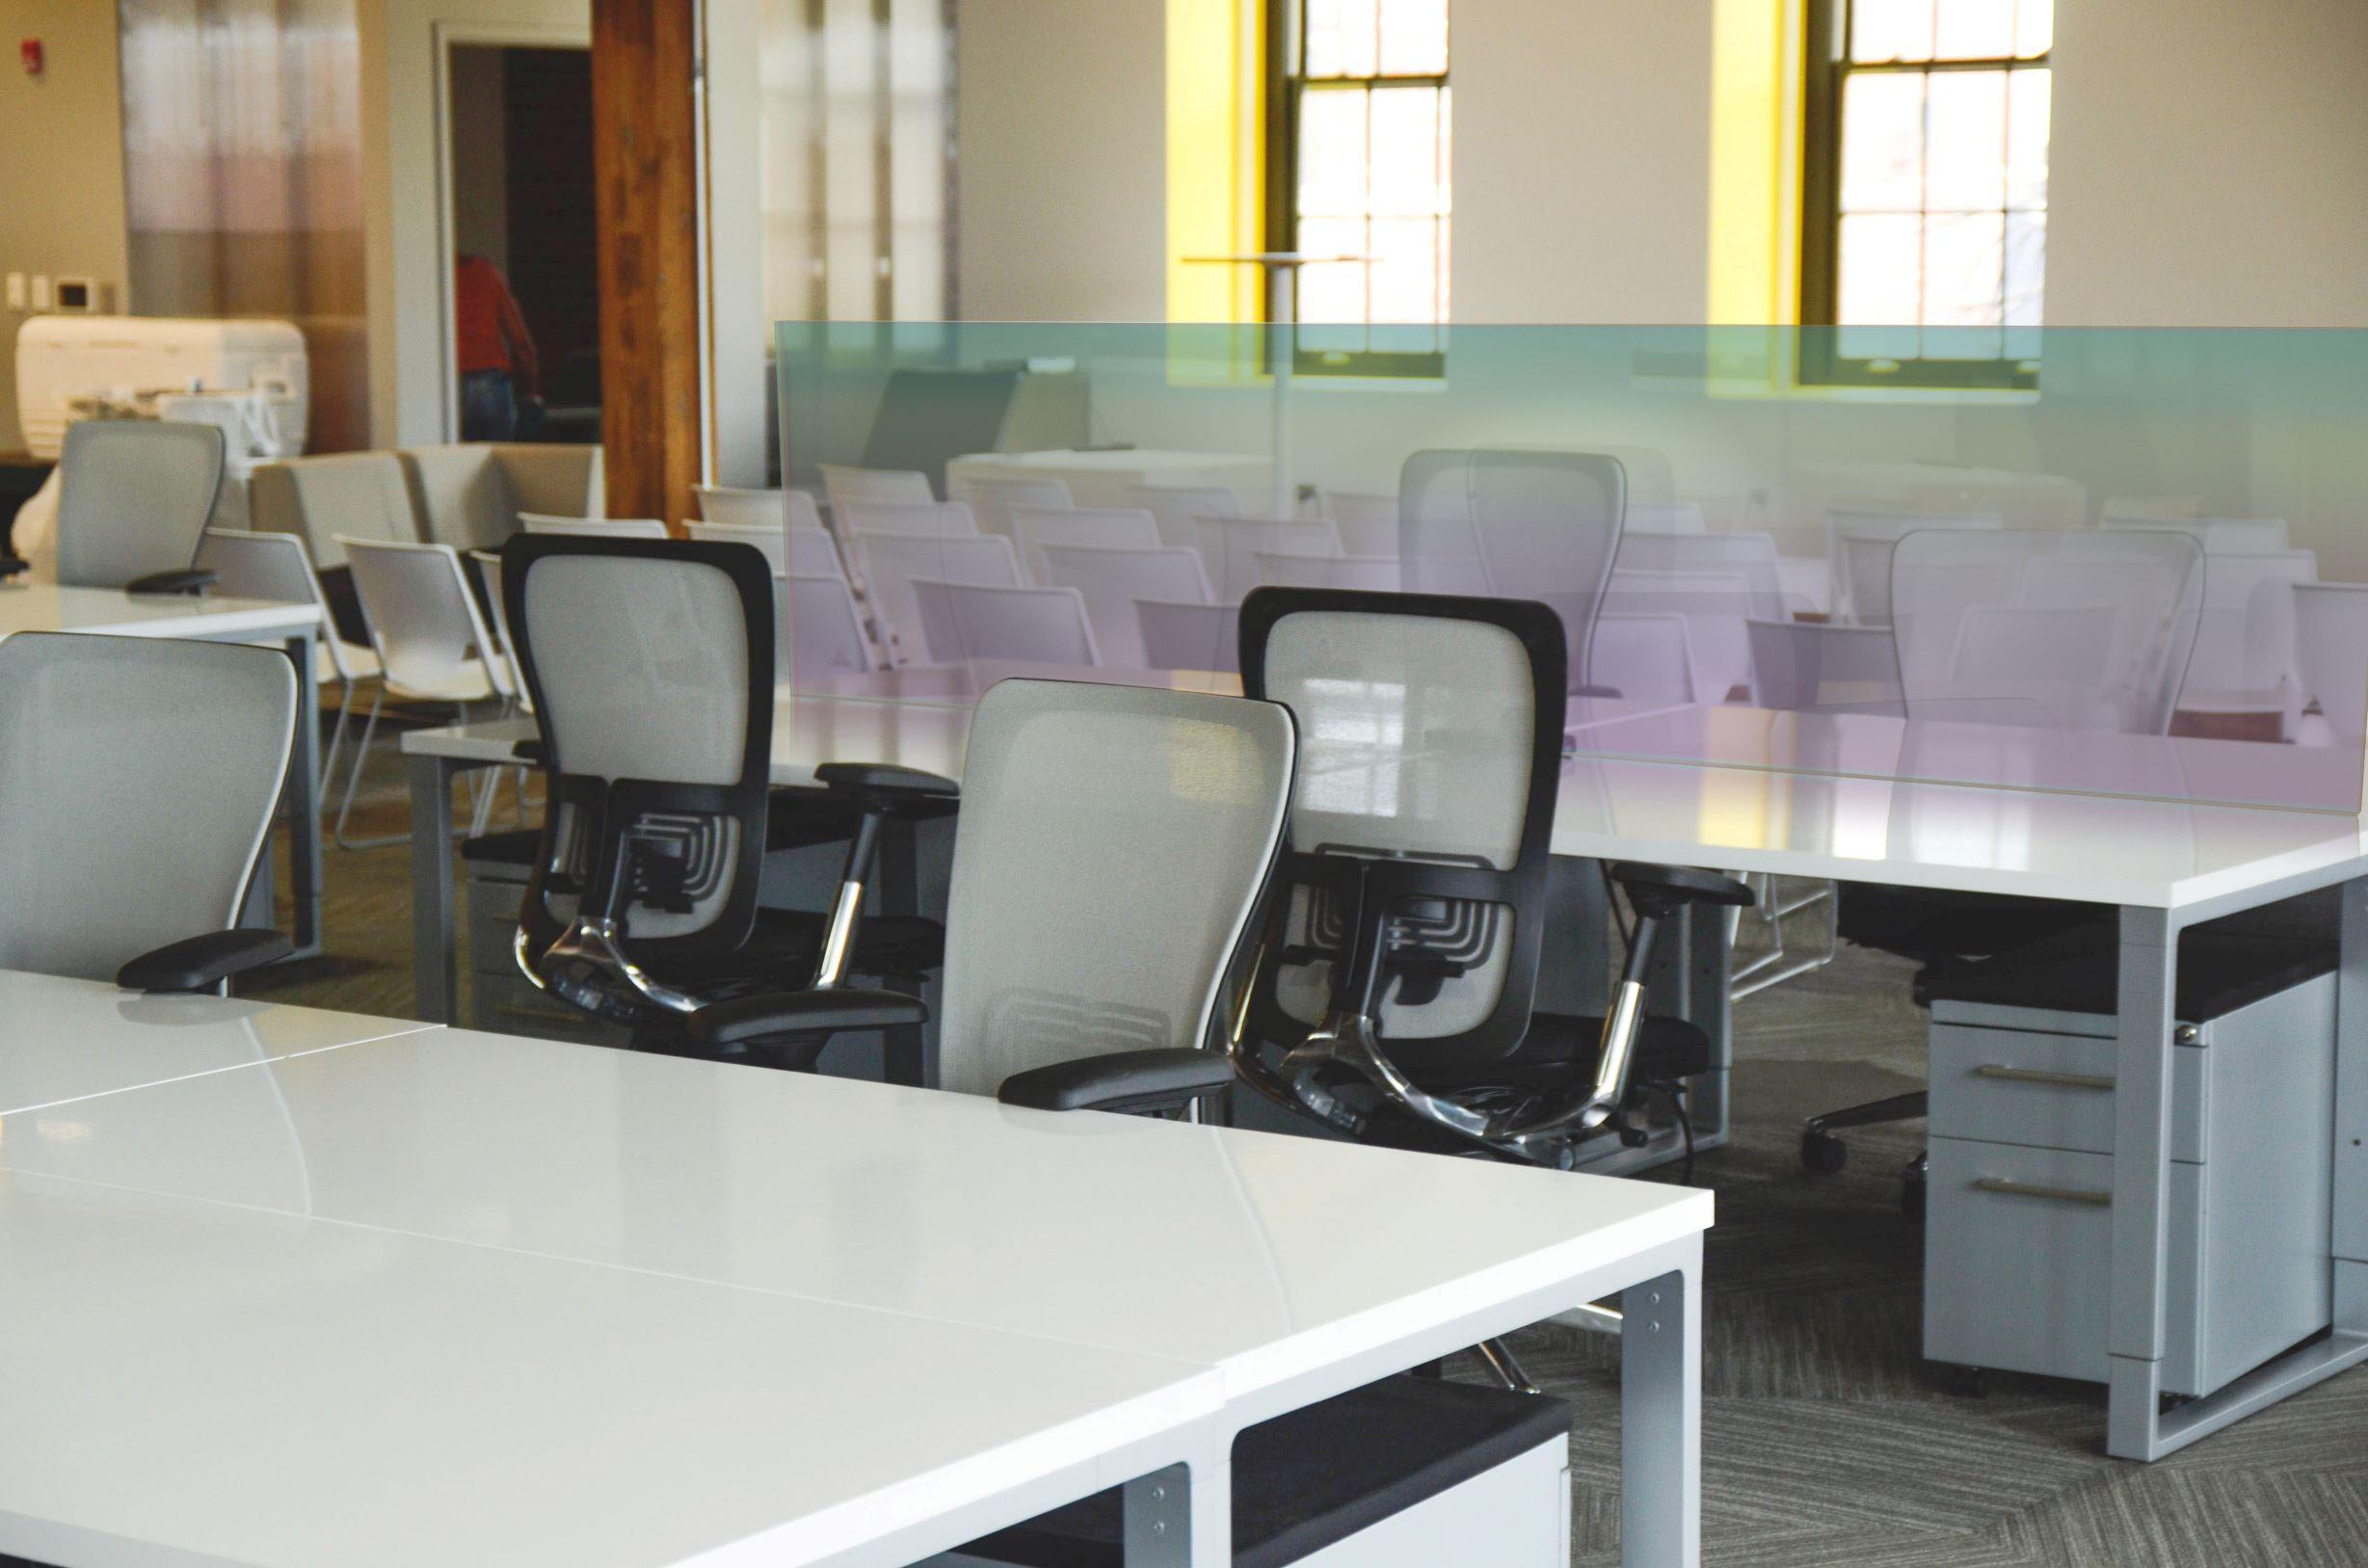 kassaschermen plexiglas schermen coronavirus spatscherm bureauscherm